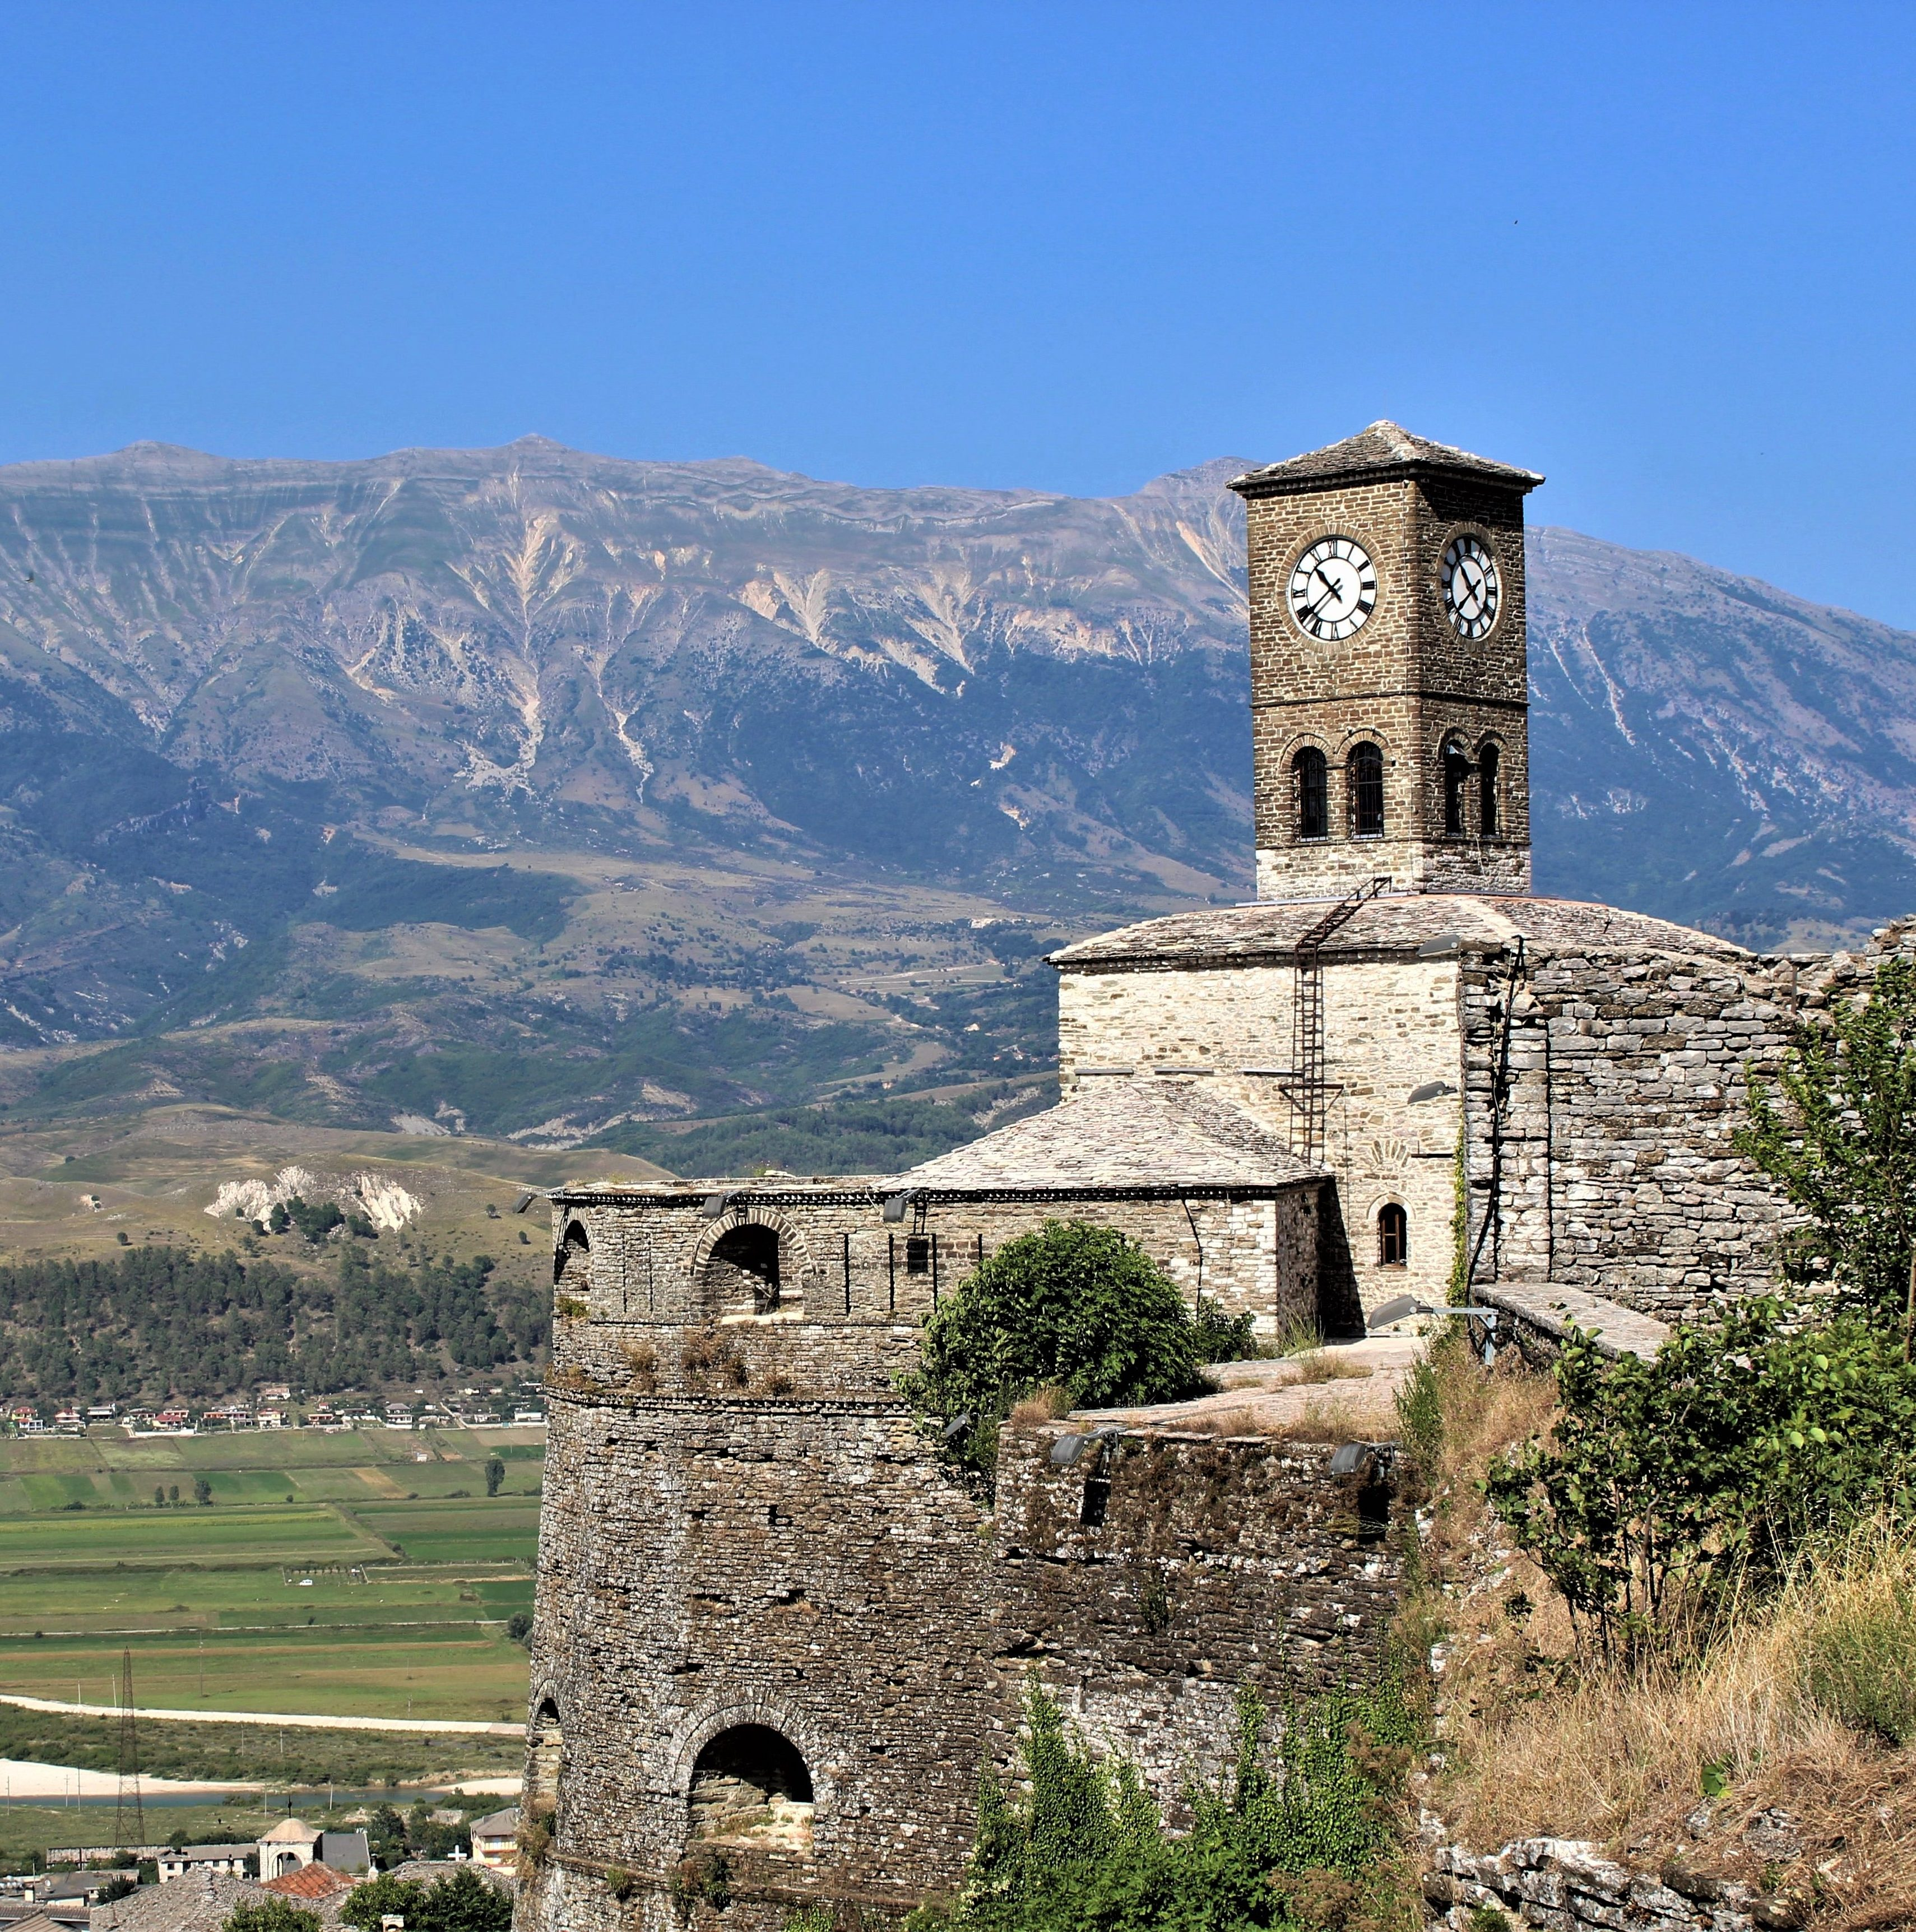 albania girocastro castello torre orologio e panorama